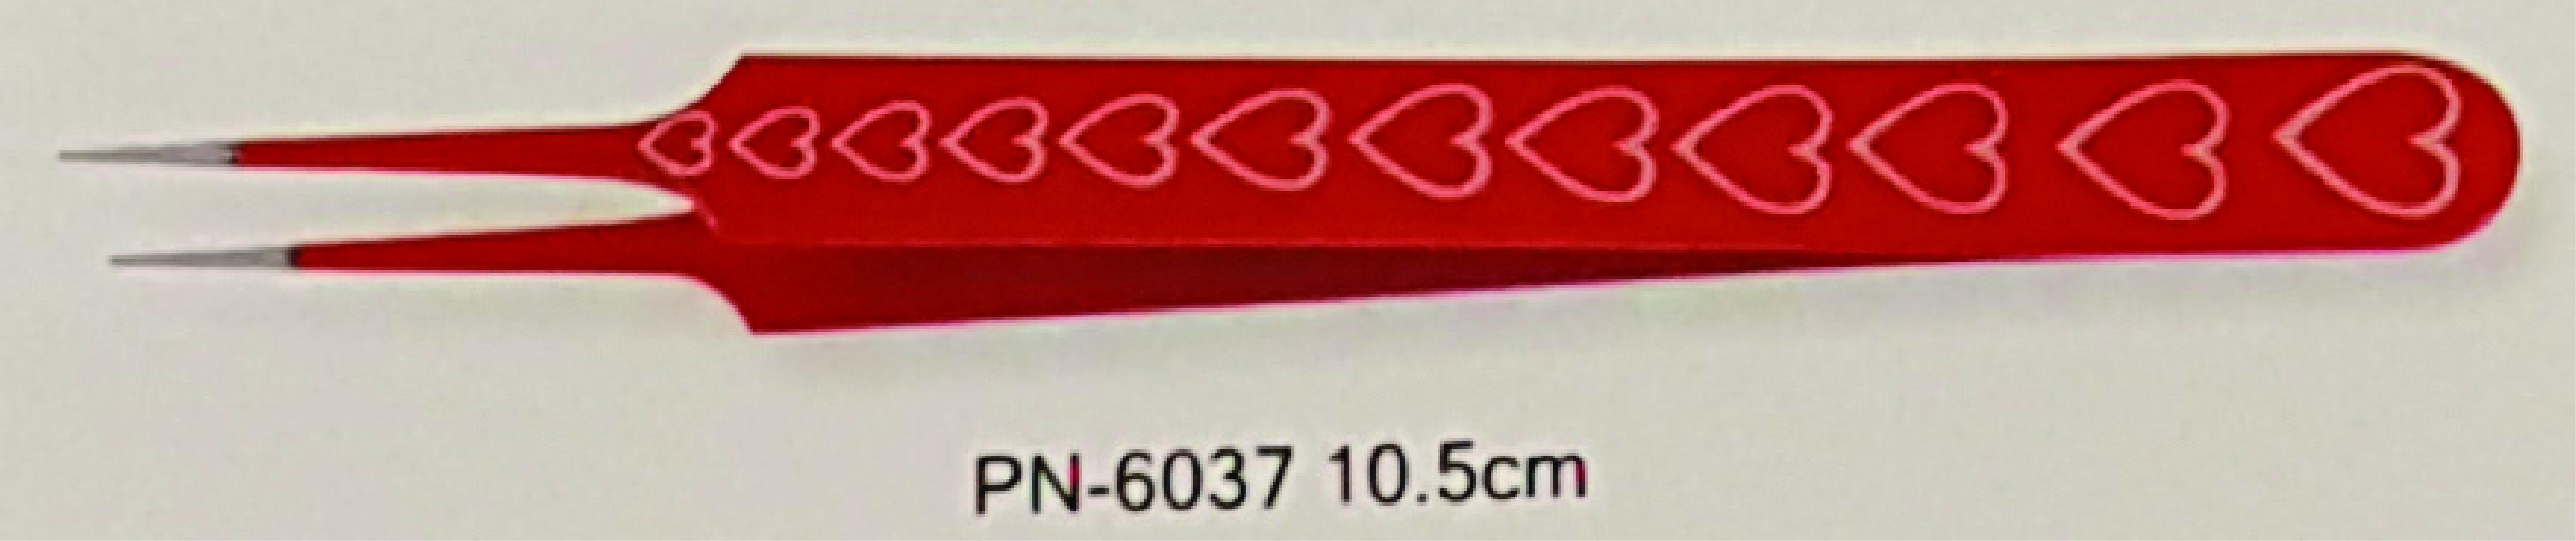 PN-6037 9.5cm